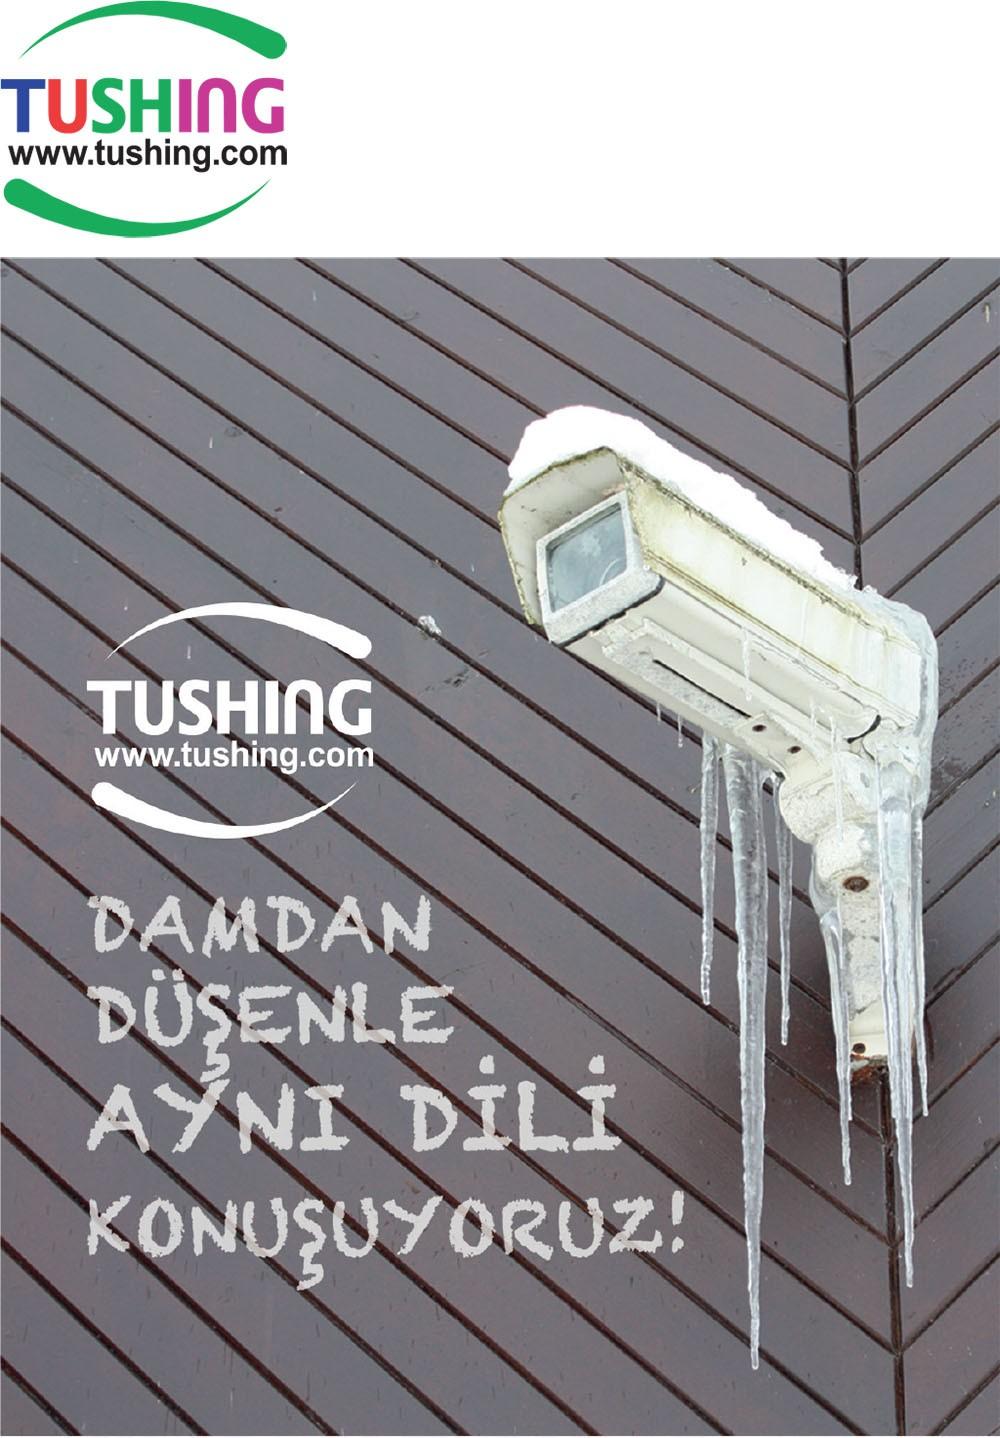 CCTV AKSESUARLARI